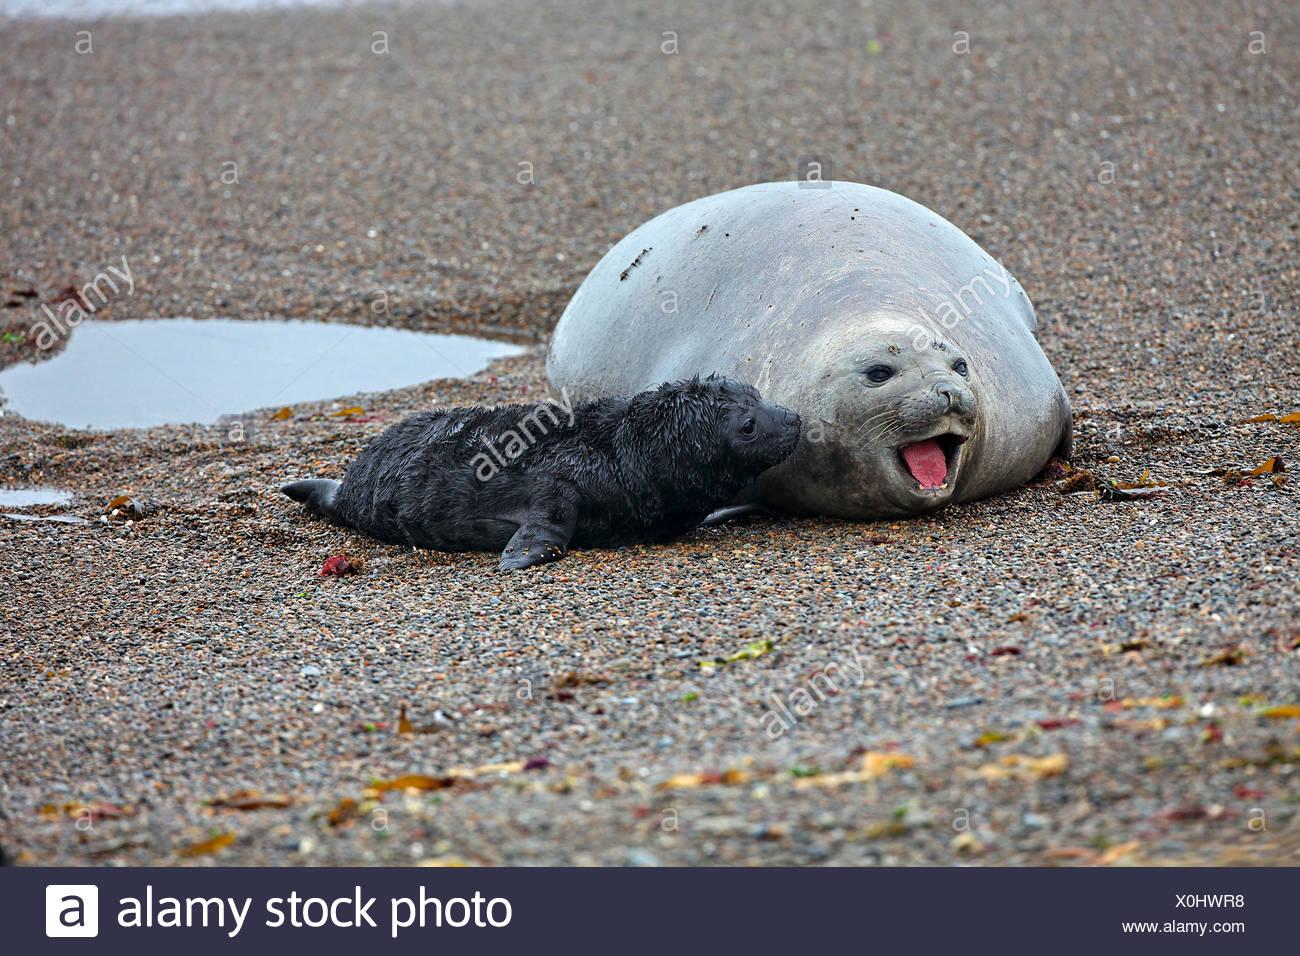 southern elephant seal (Mirounga leonina), female and newborn cub on the beach, Argentina, Valdes Peninsula - Stock Image